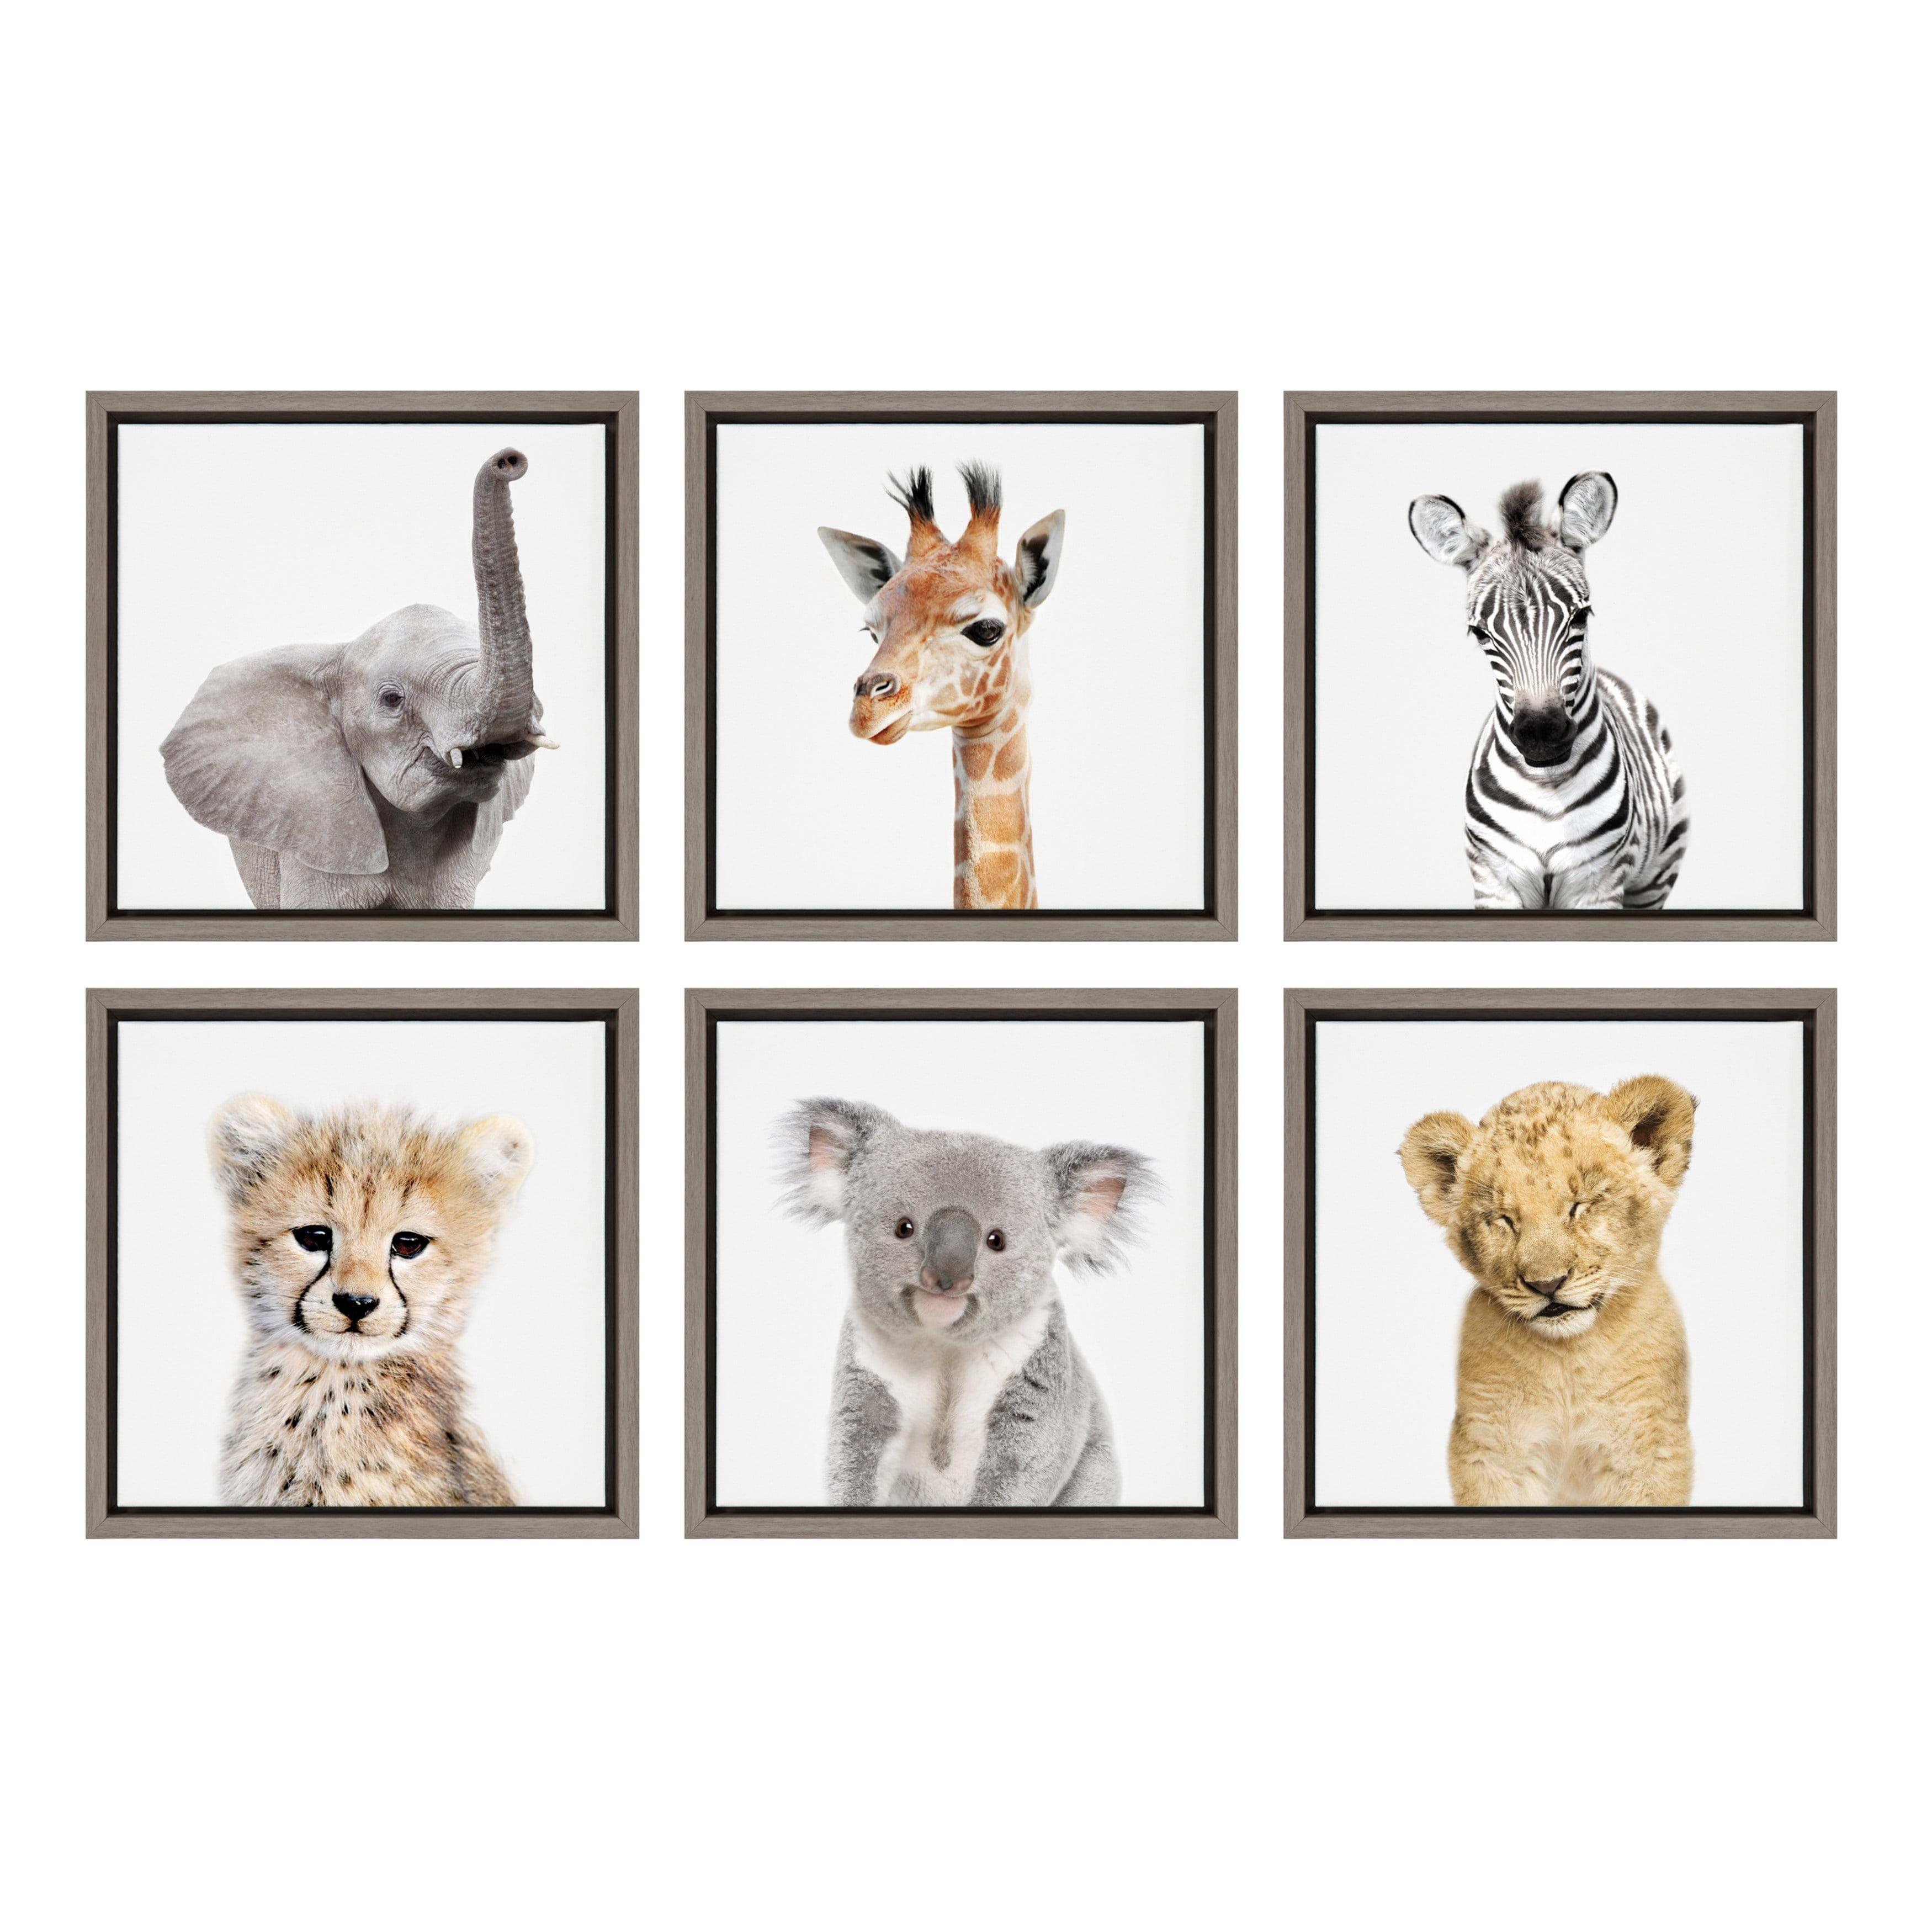 Kate and Laurel Sylvie Wildlife Safari Animal Print Photo Portraits: Elephant, Giraffe, Zebra, Cheetah, Koala and Lion Framed Canvas Wall Art by Amy Peterson, 13x13 Gray, Set of 6